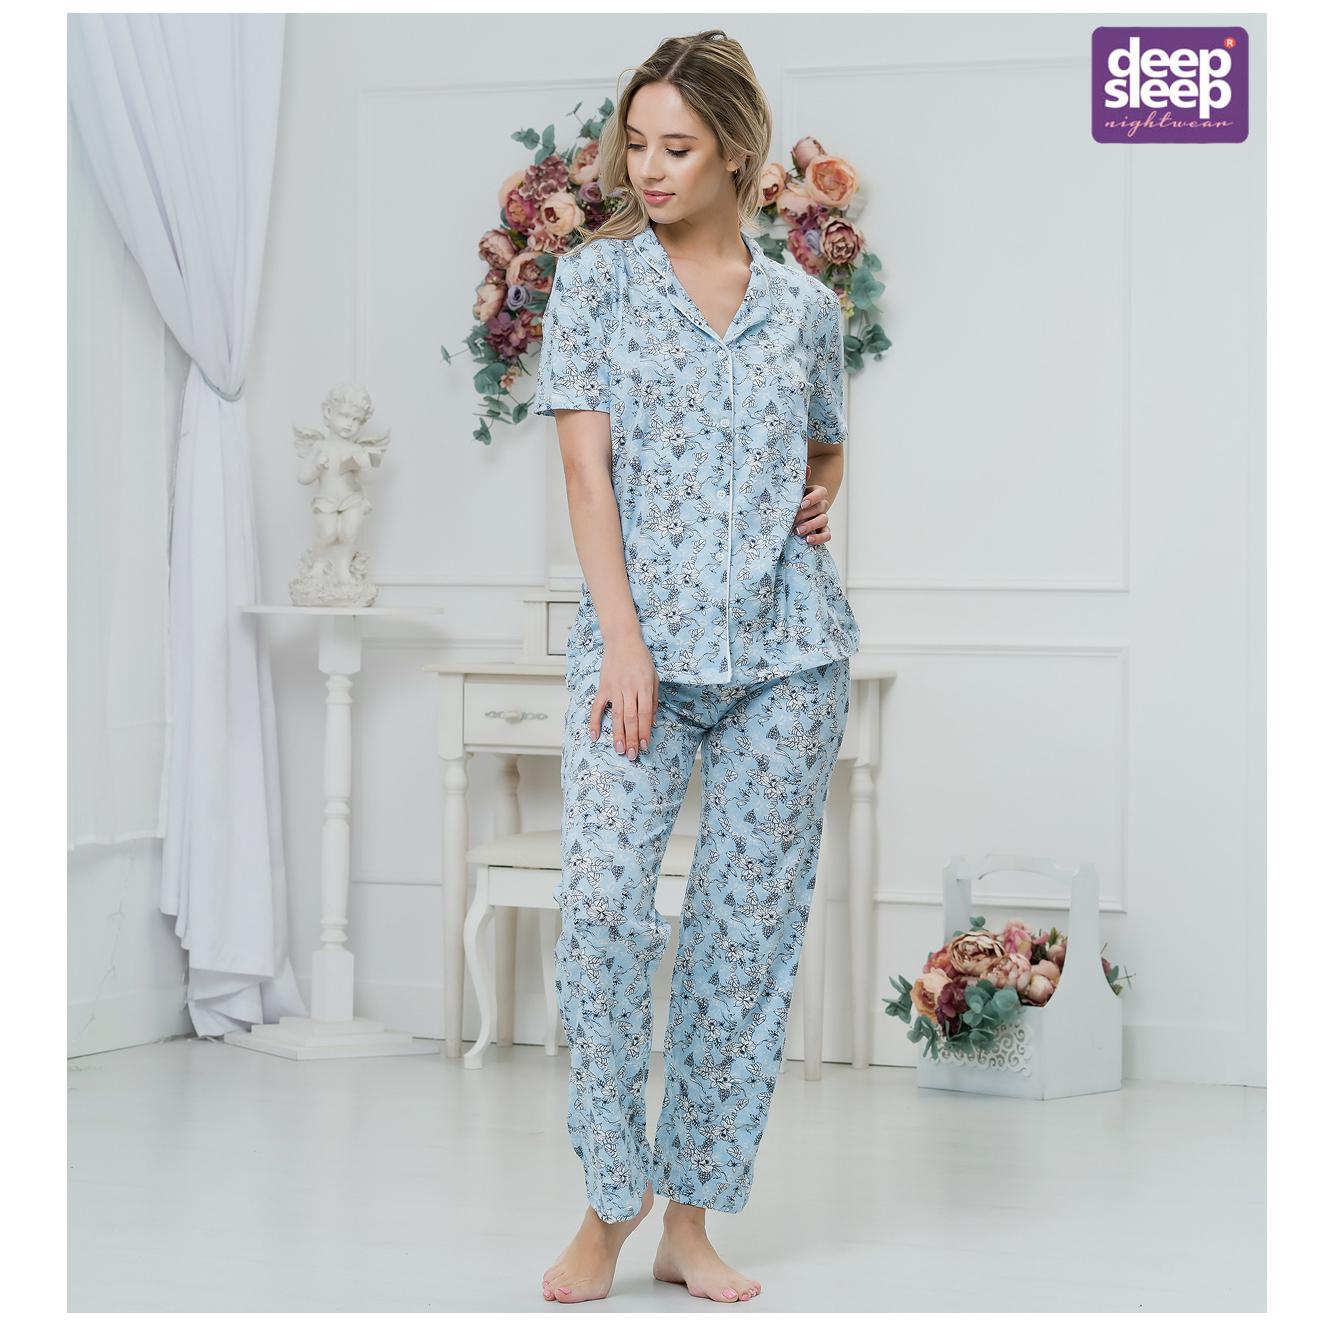 Пижамы Пижама Deep Sleep 13202 kozabiat.shop888_777_954.jpg